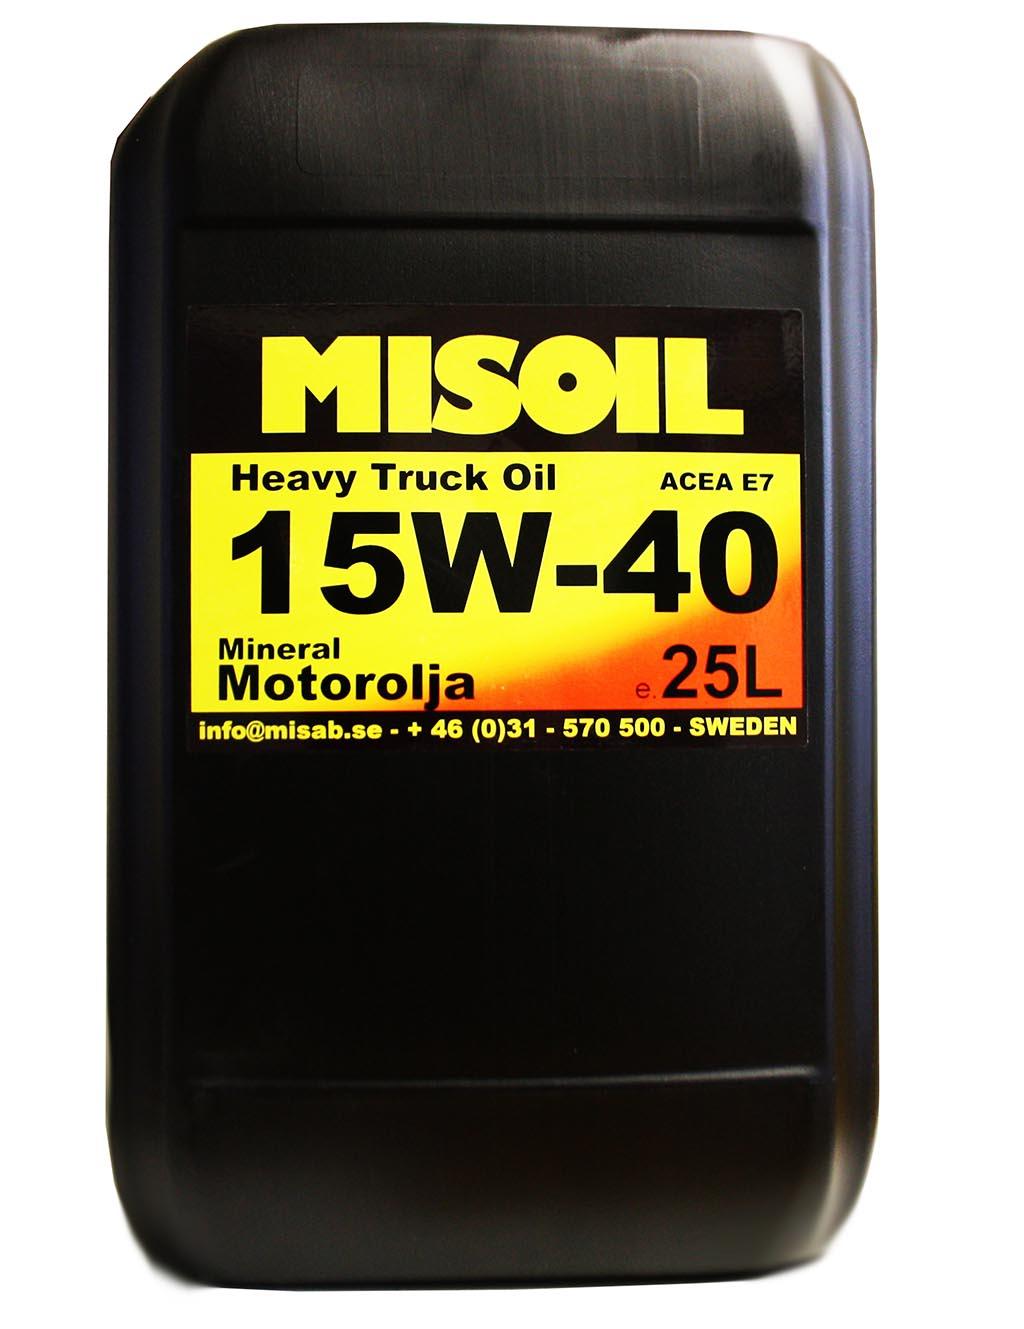 MISOIL HTO 15W-40